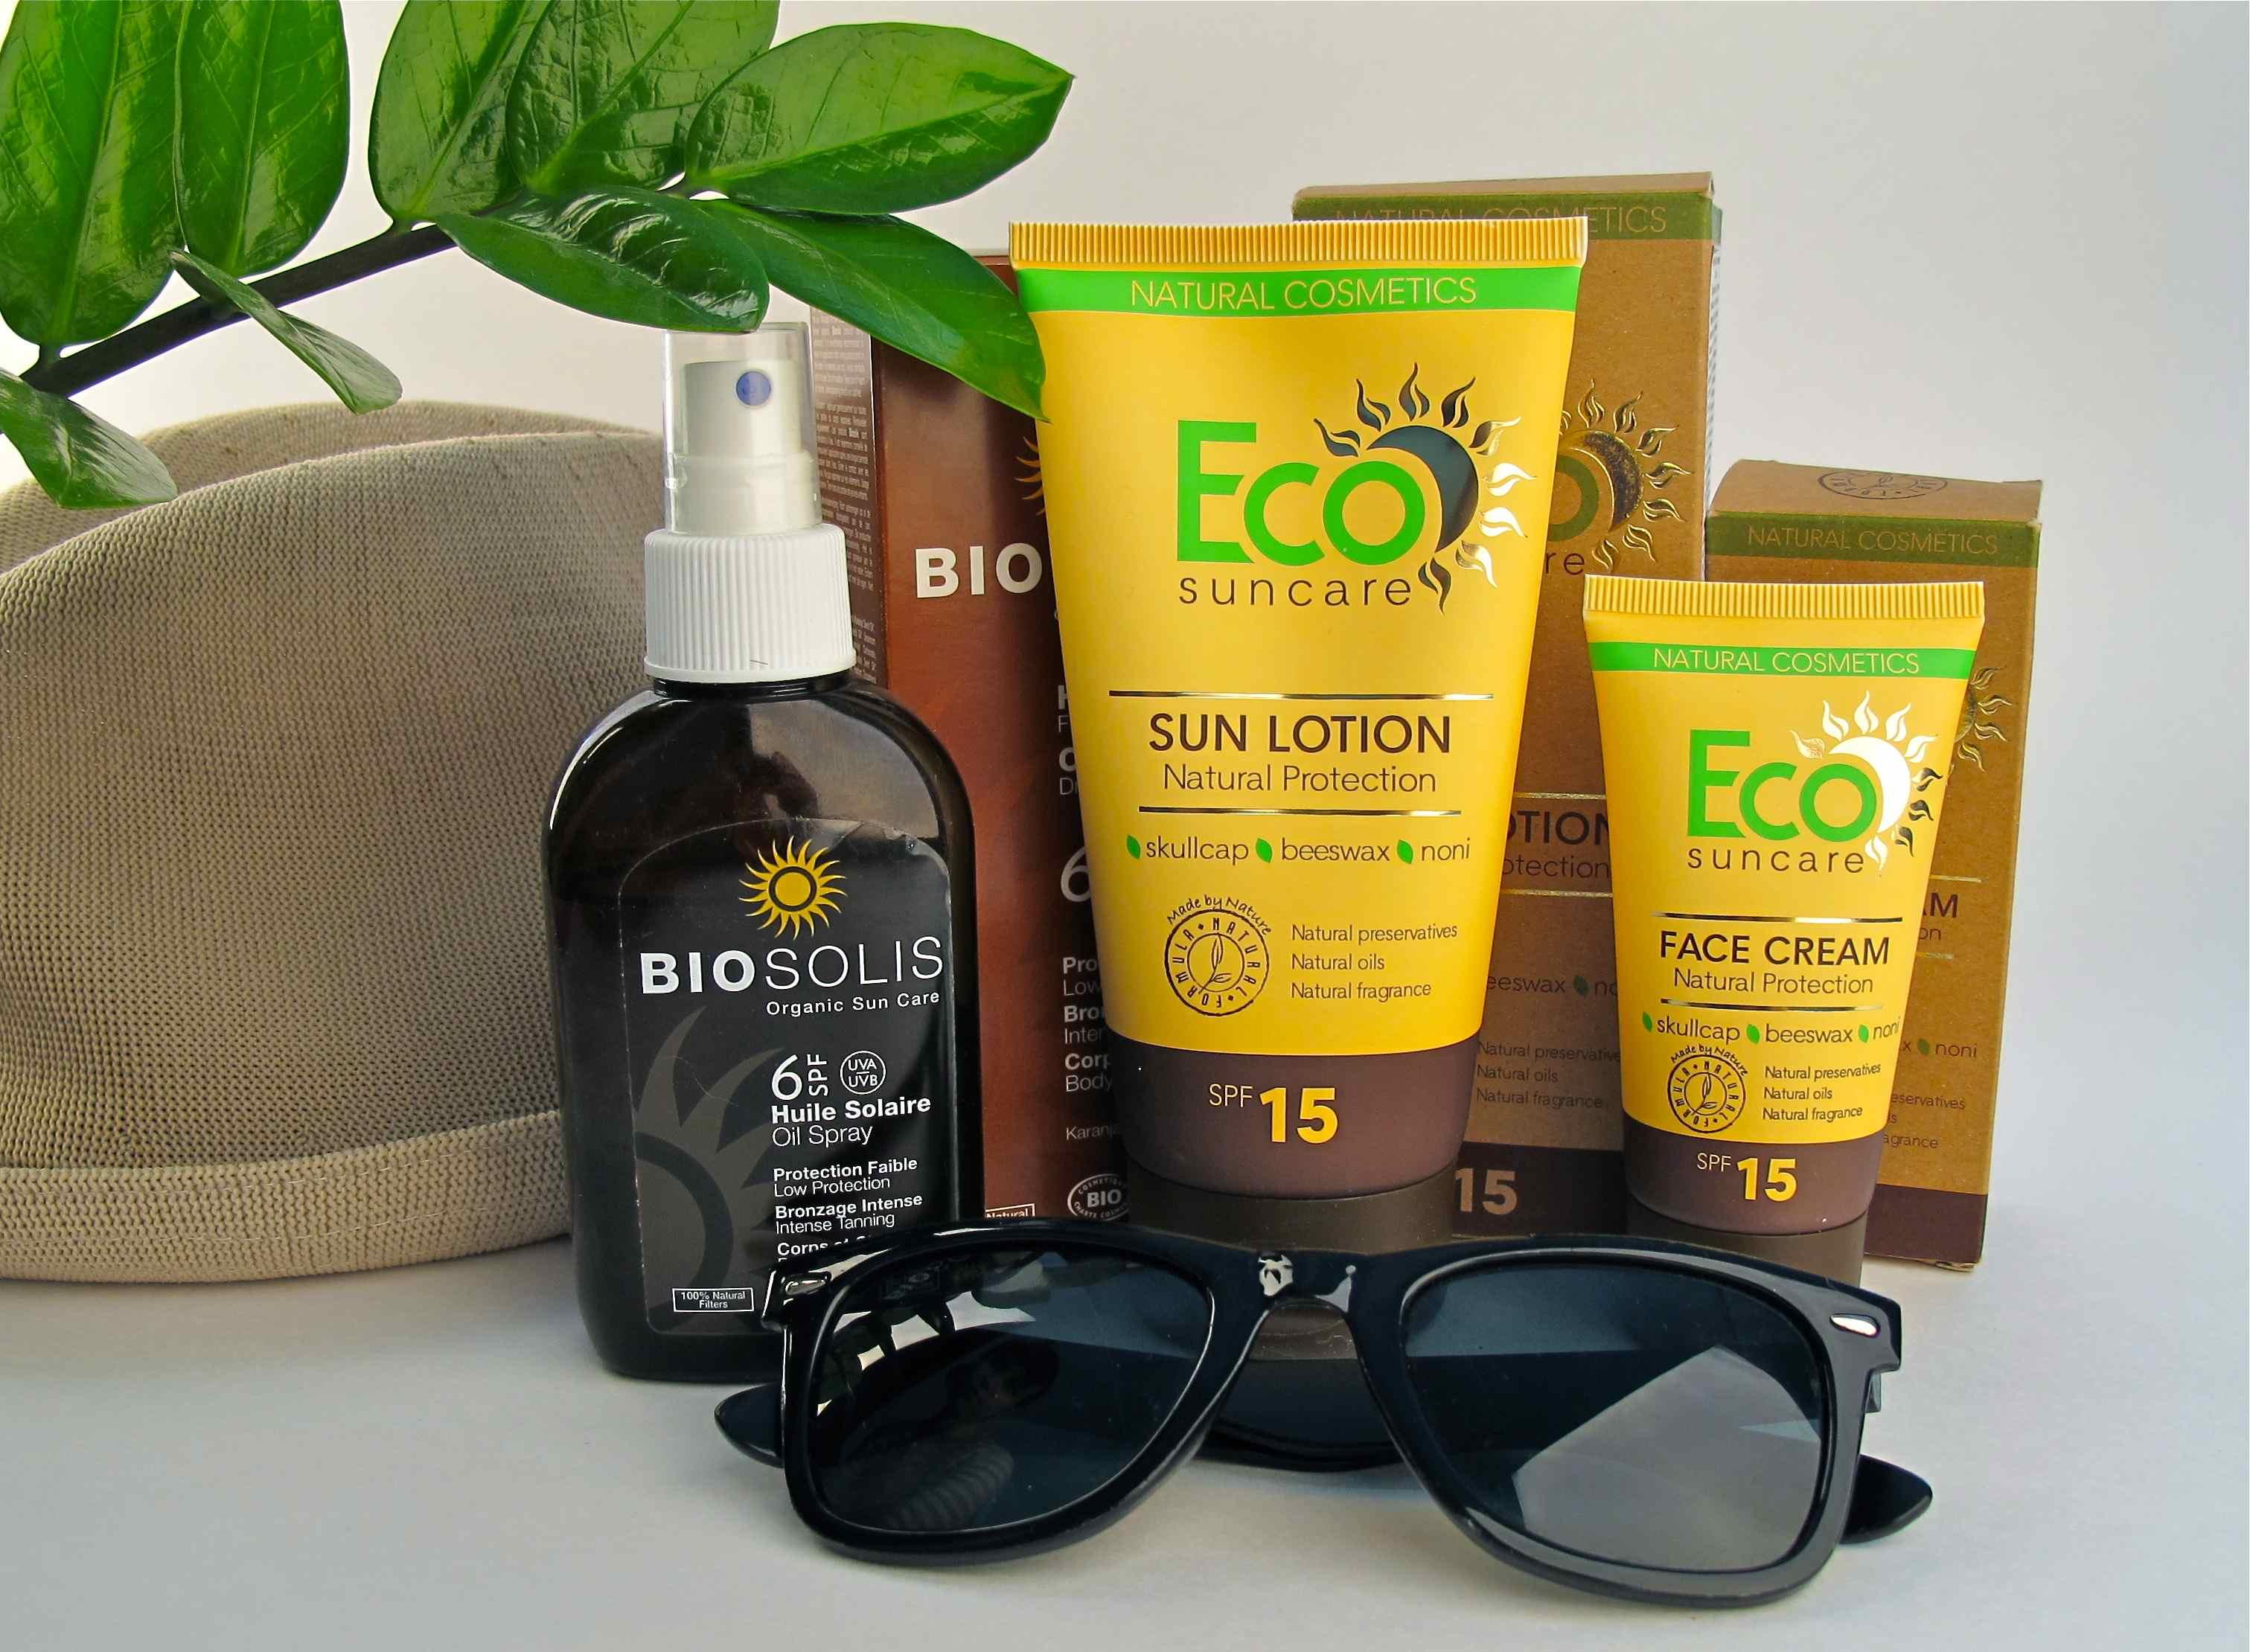 Sun protection products eco suncare biosolis